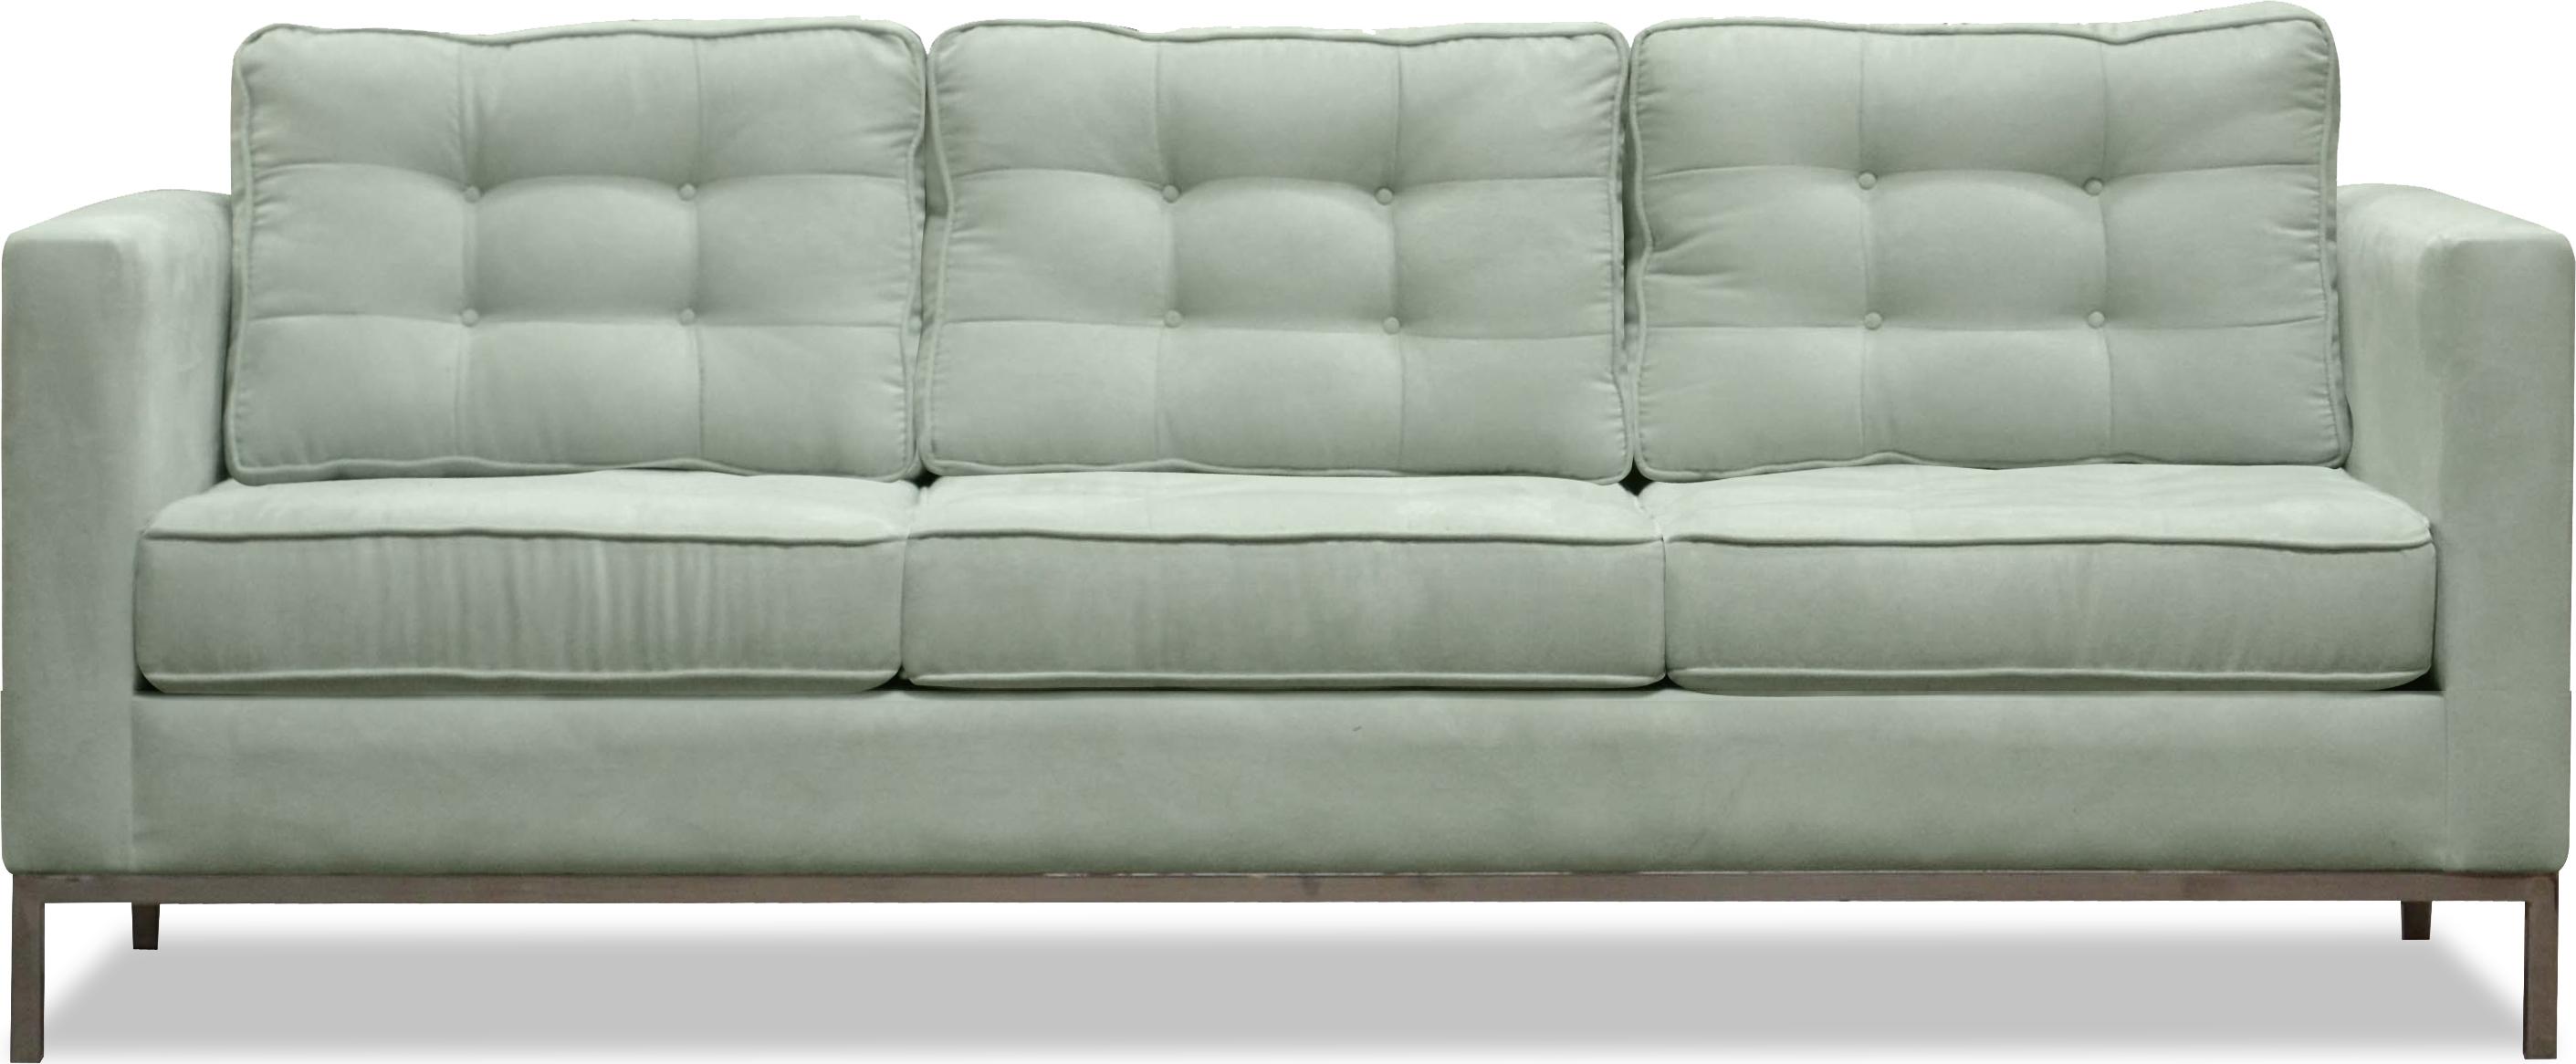 The Sofa Company Uno Sofas Couches Custom Slipcover Sofas